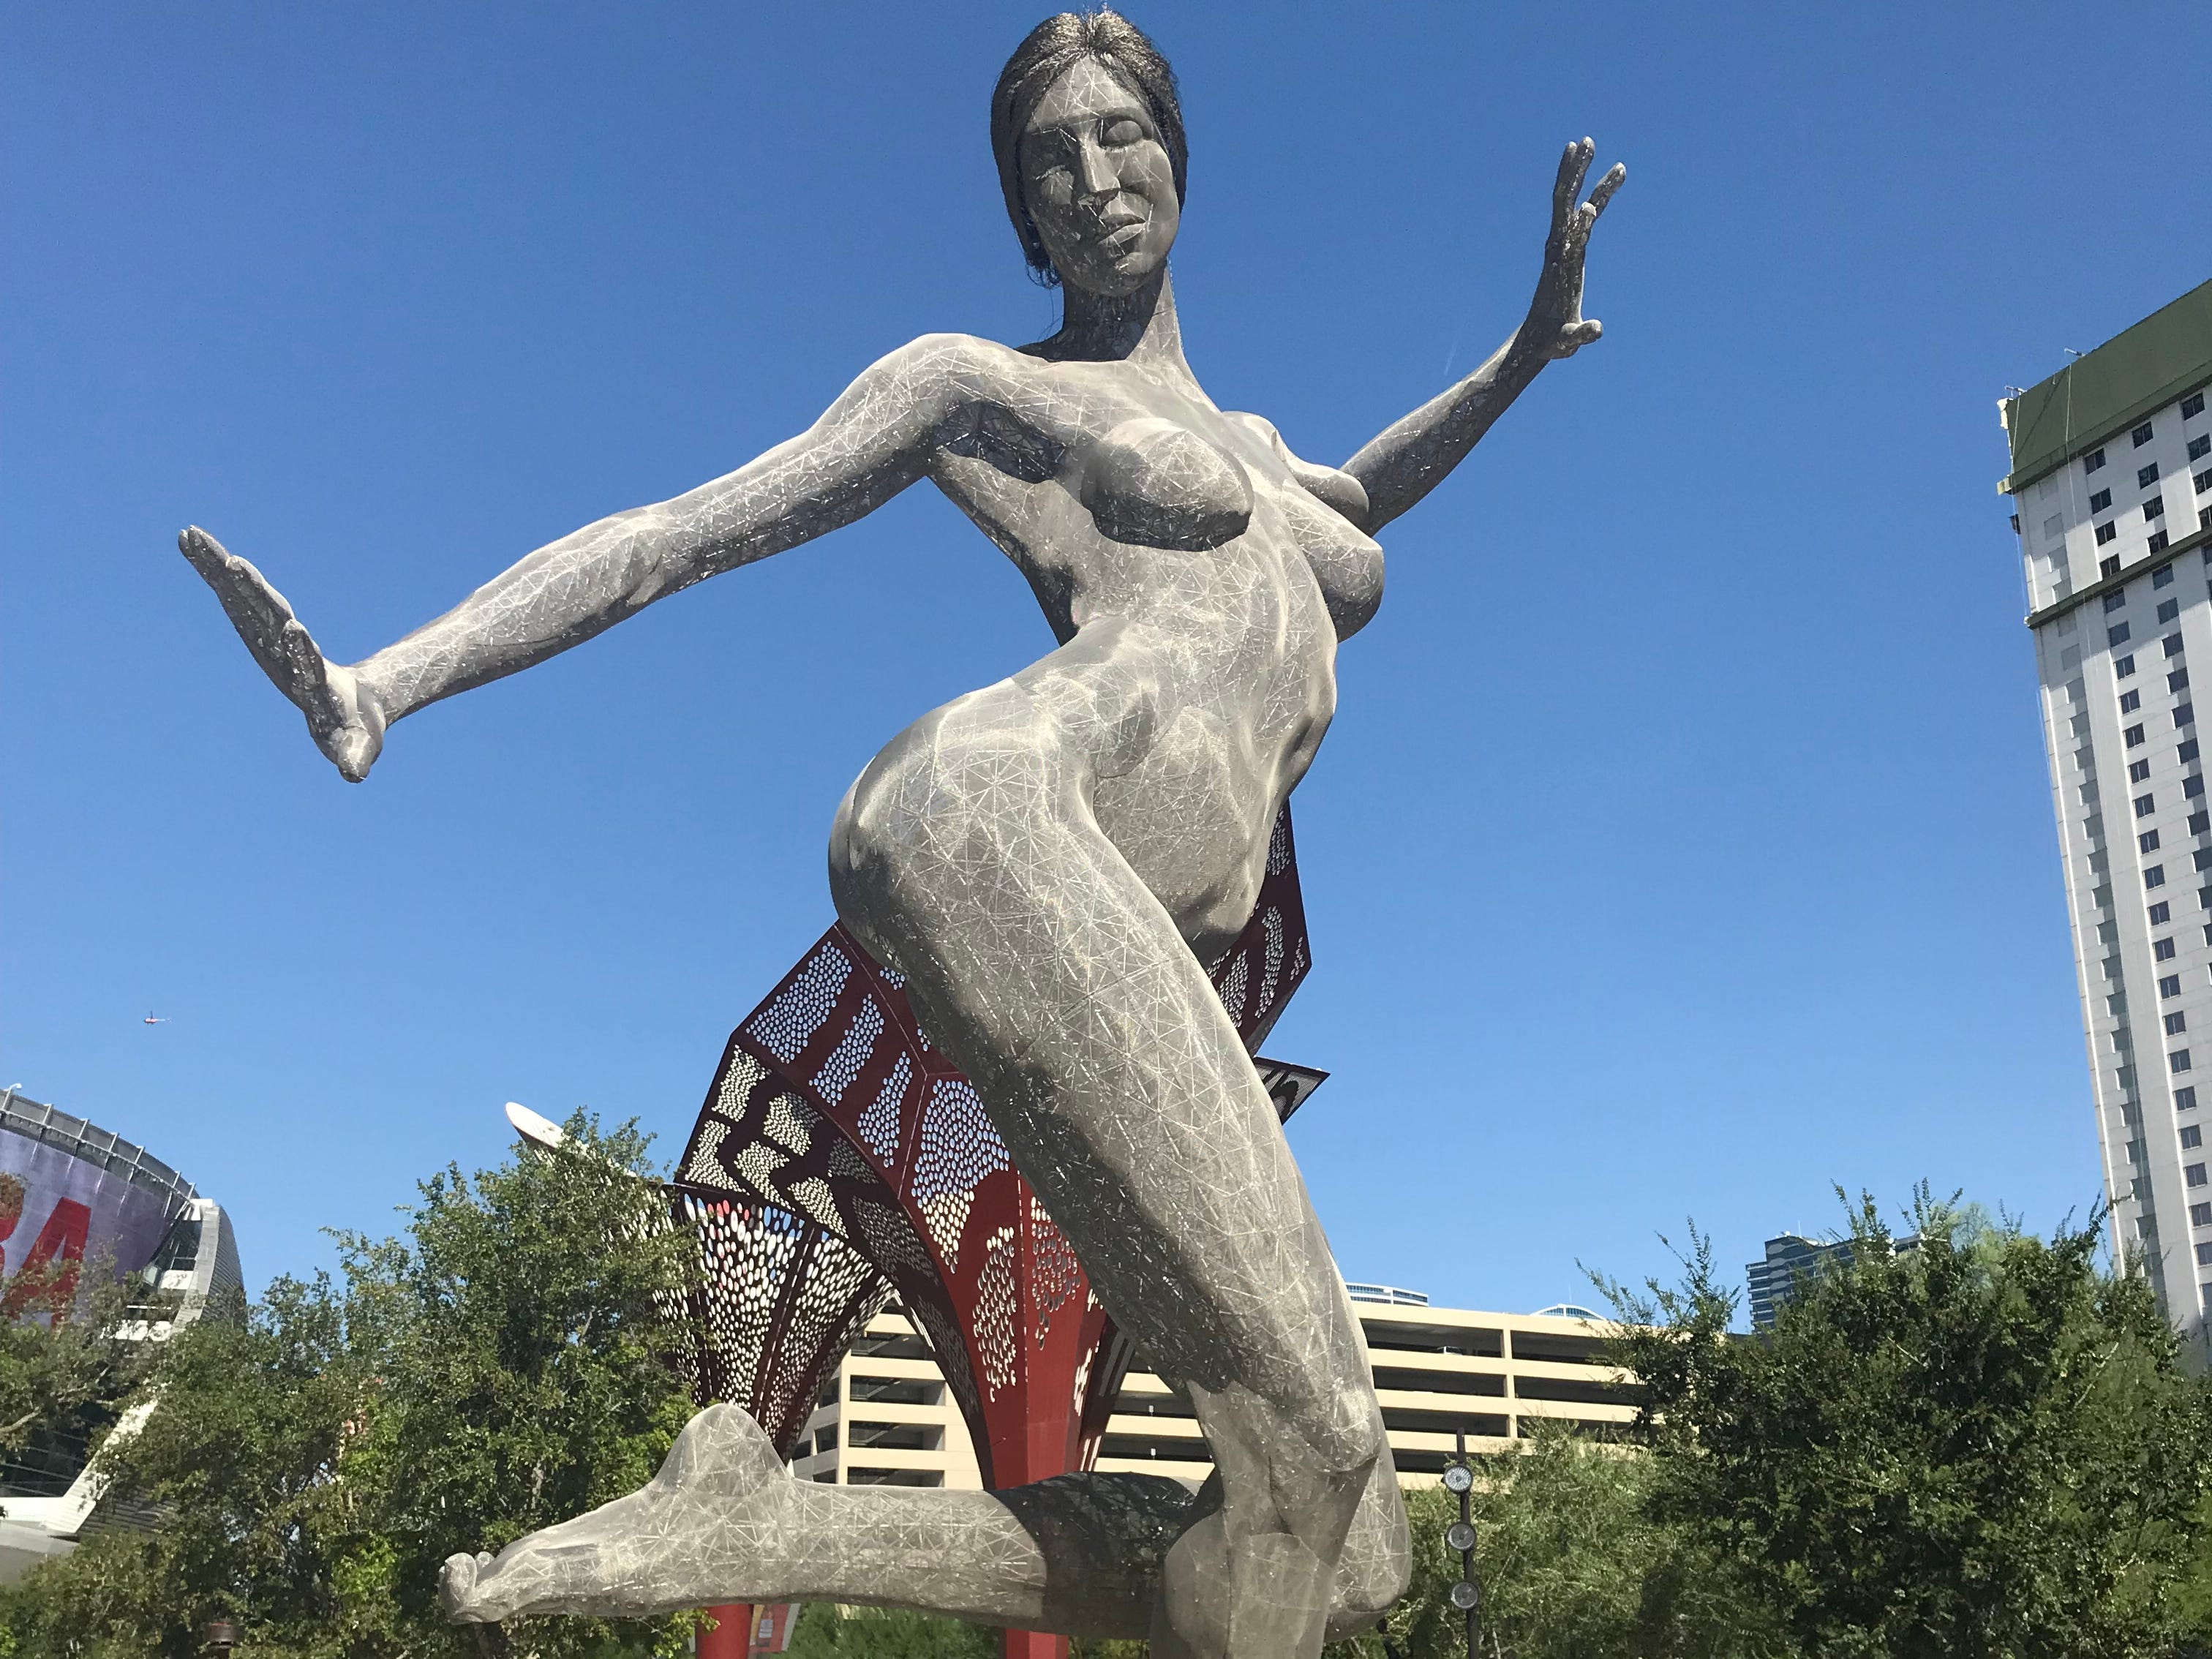 The 40-foot Bliss Dance sculpture is a centerpiece of The Park Vegas.